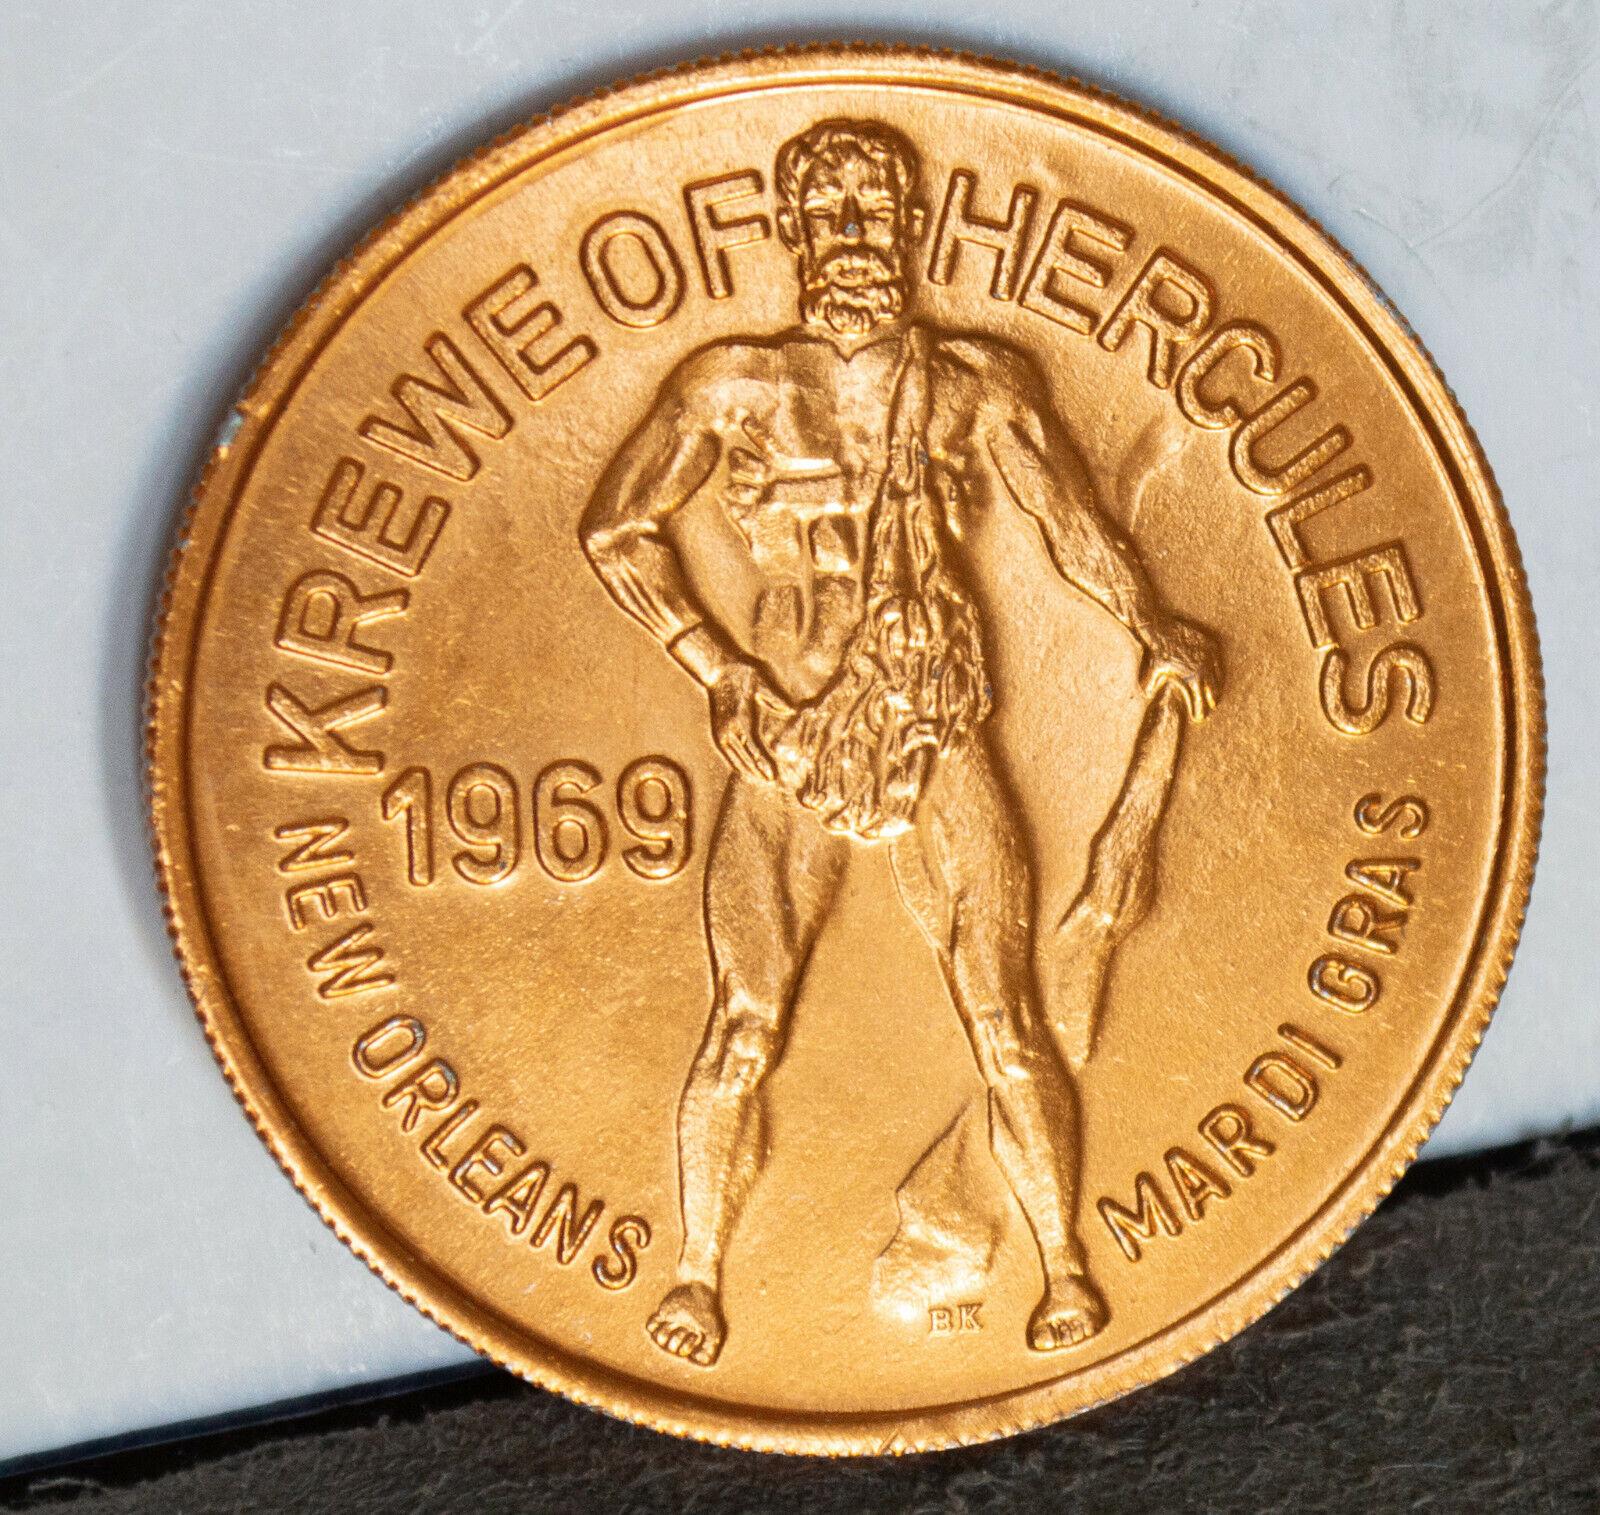 1969 LABORS OF HERCULES Gold Alum Mardi Gras Doubloon